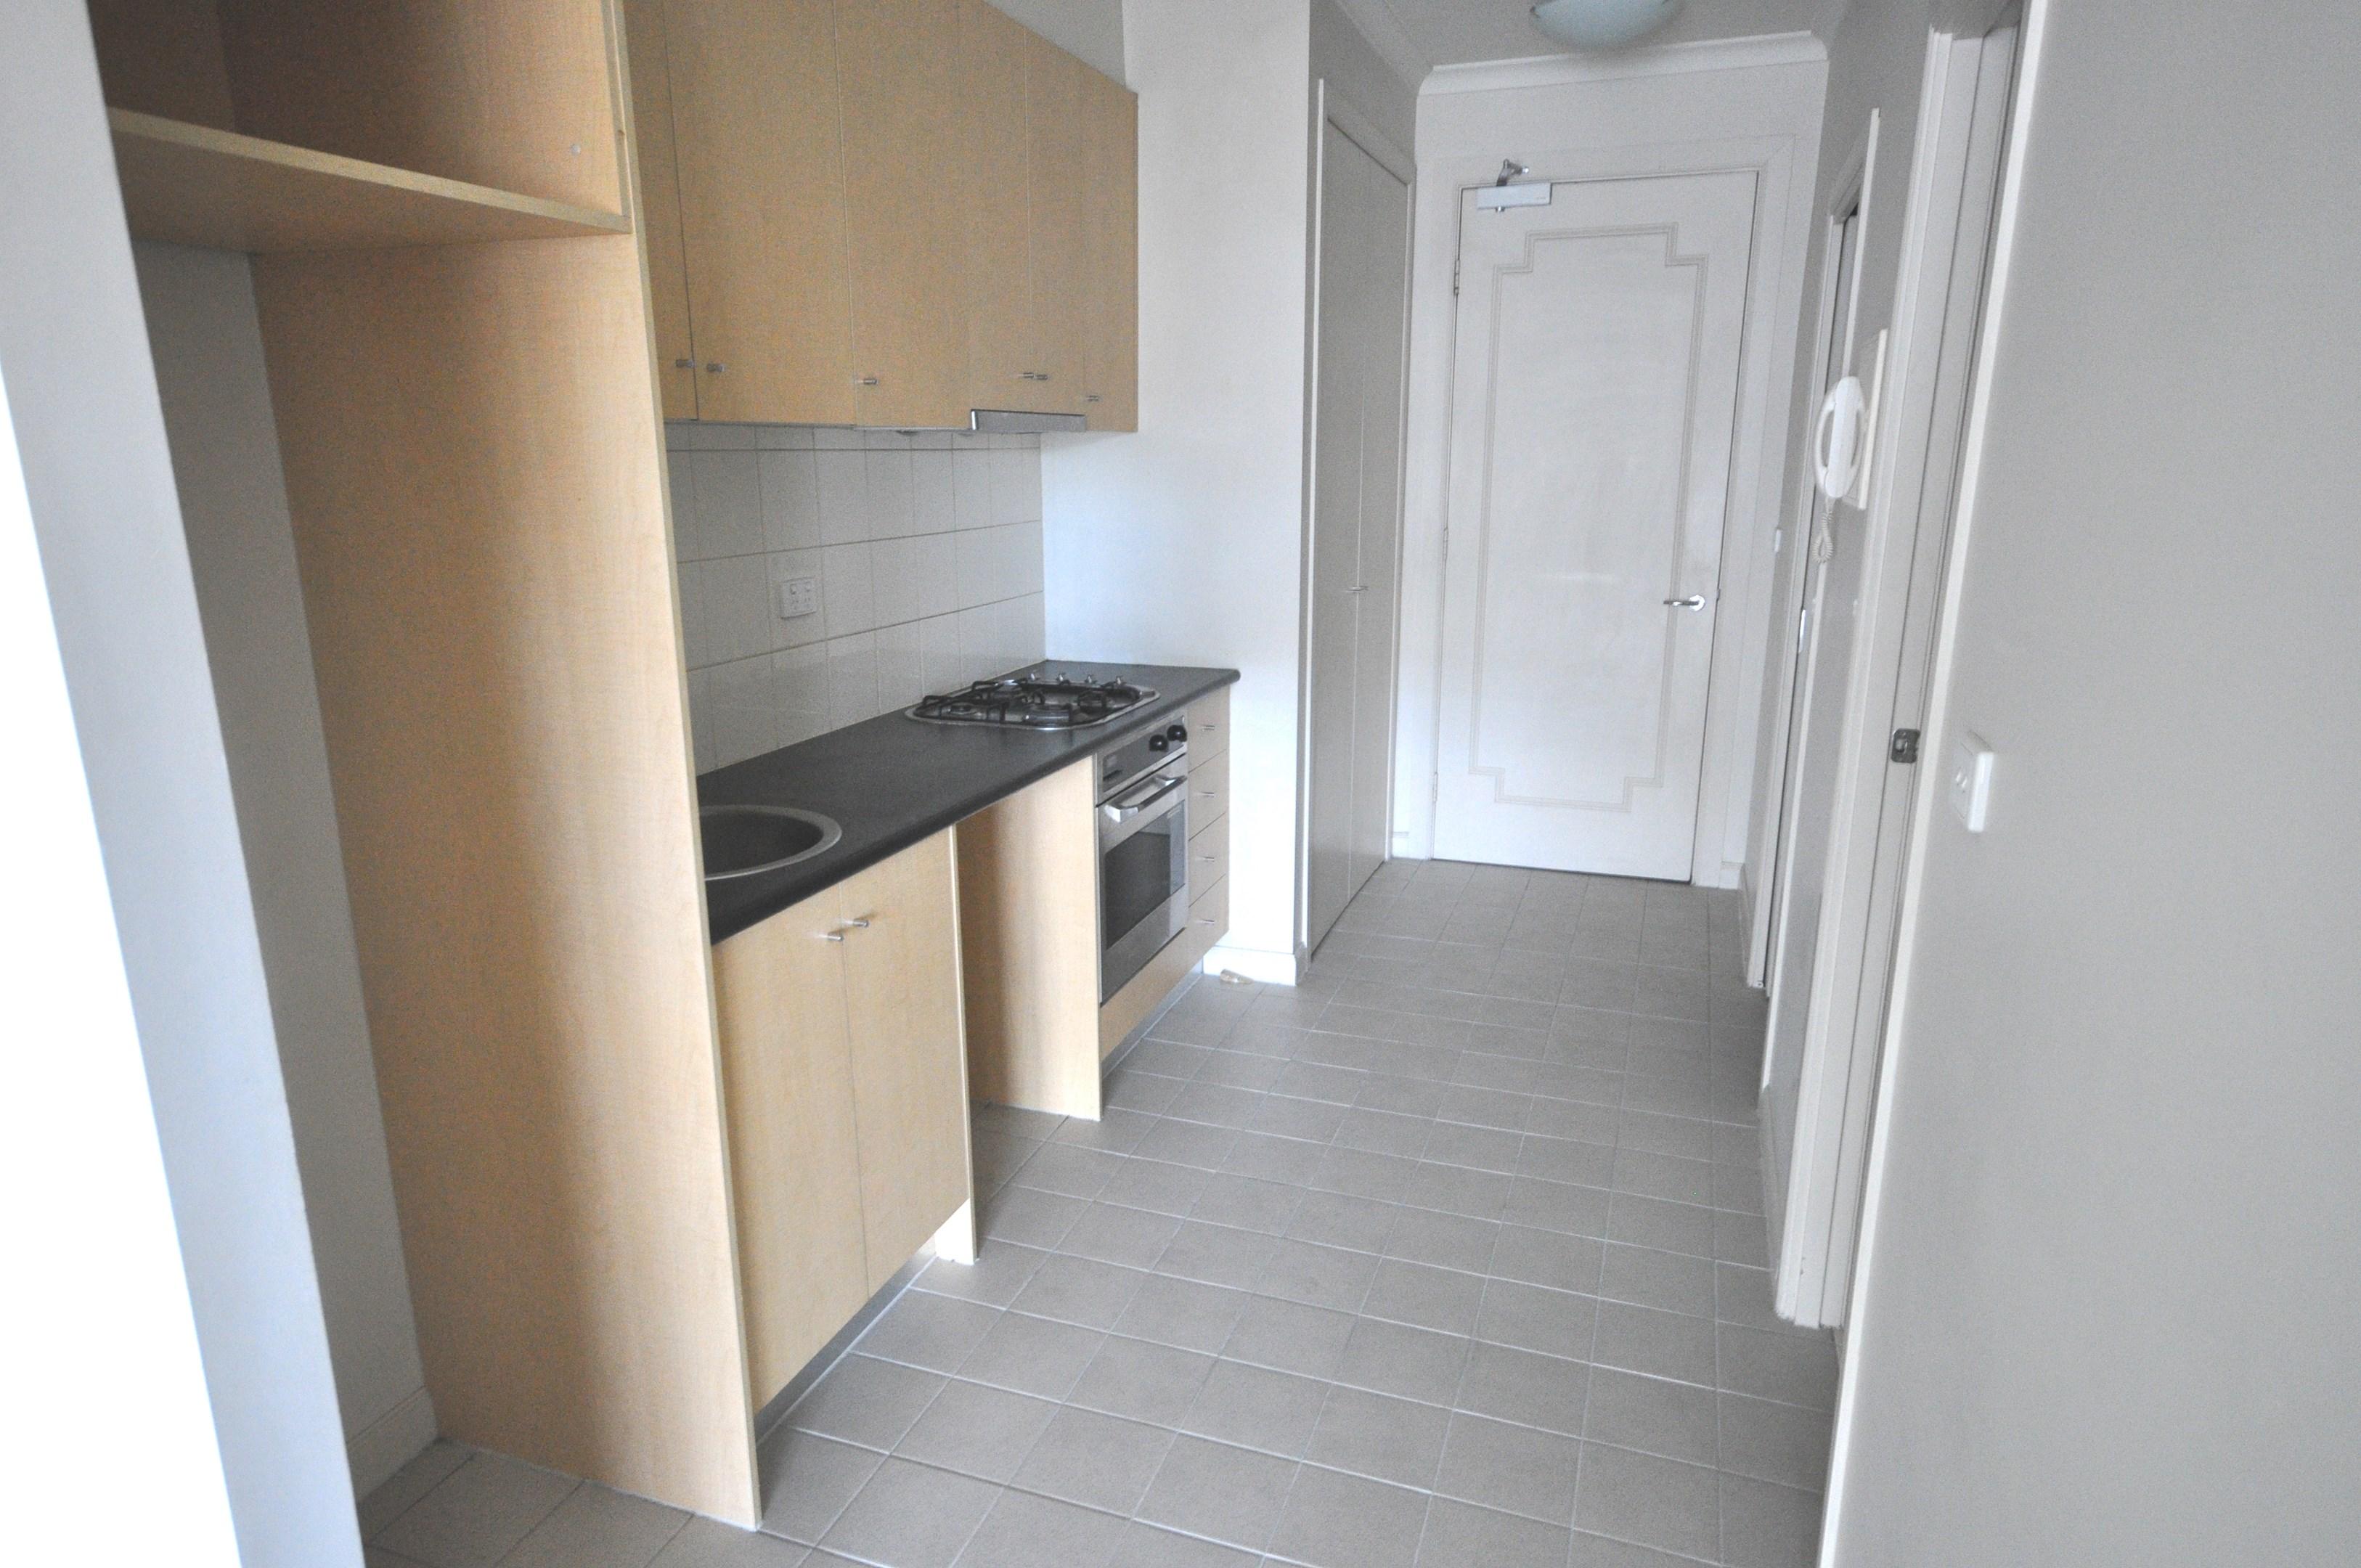 712547 Flinders Lane, Melbourne Vic 3000  Apartment For Rent